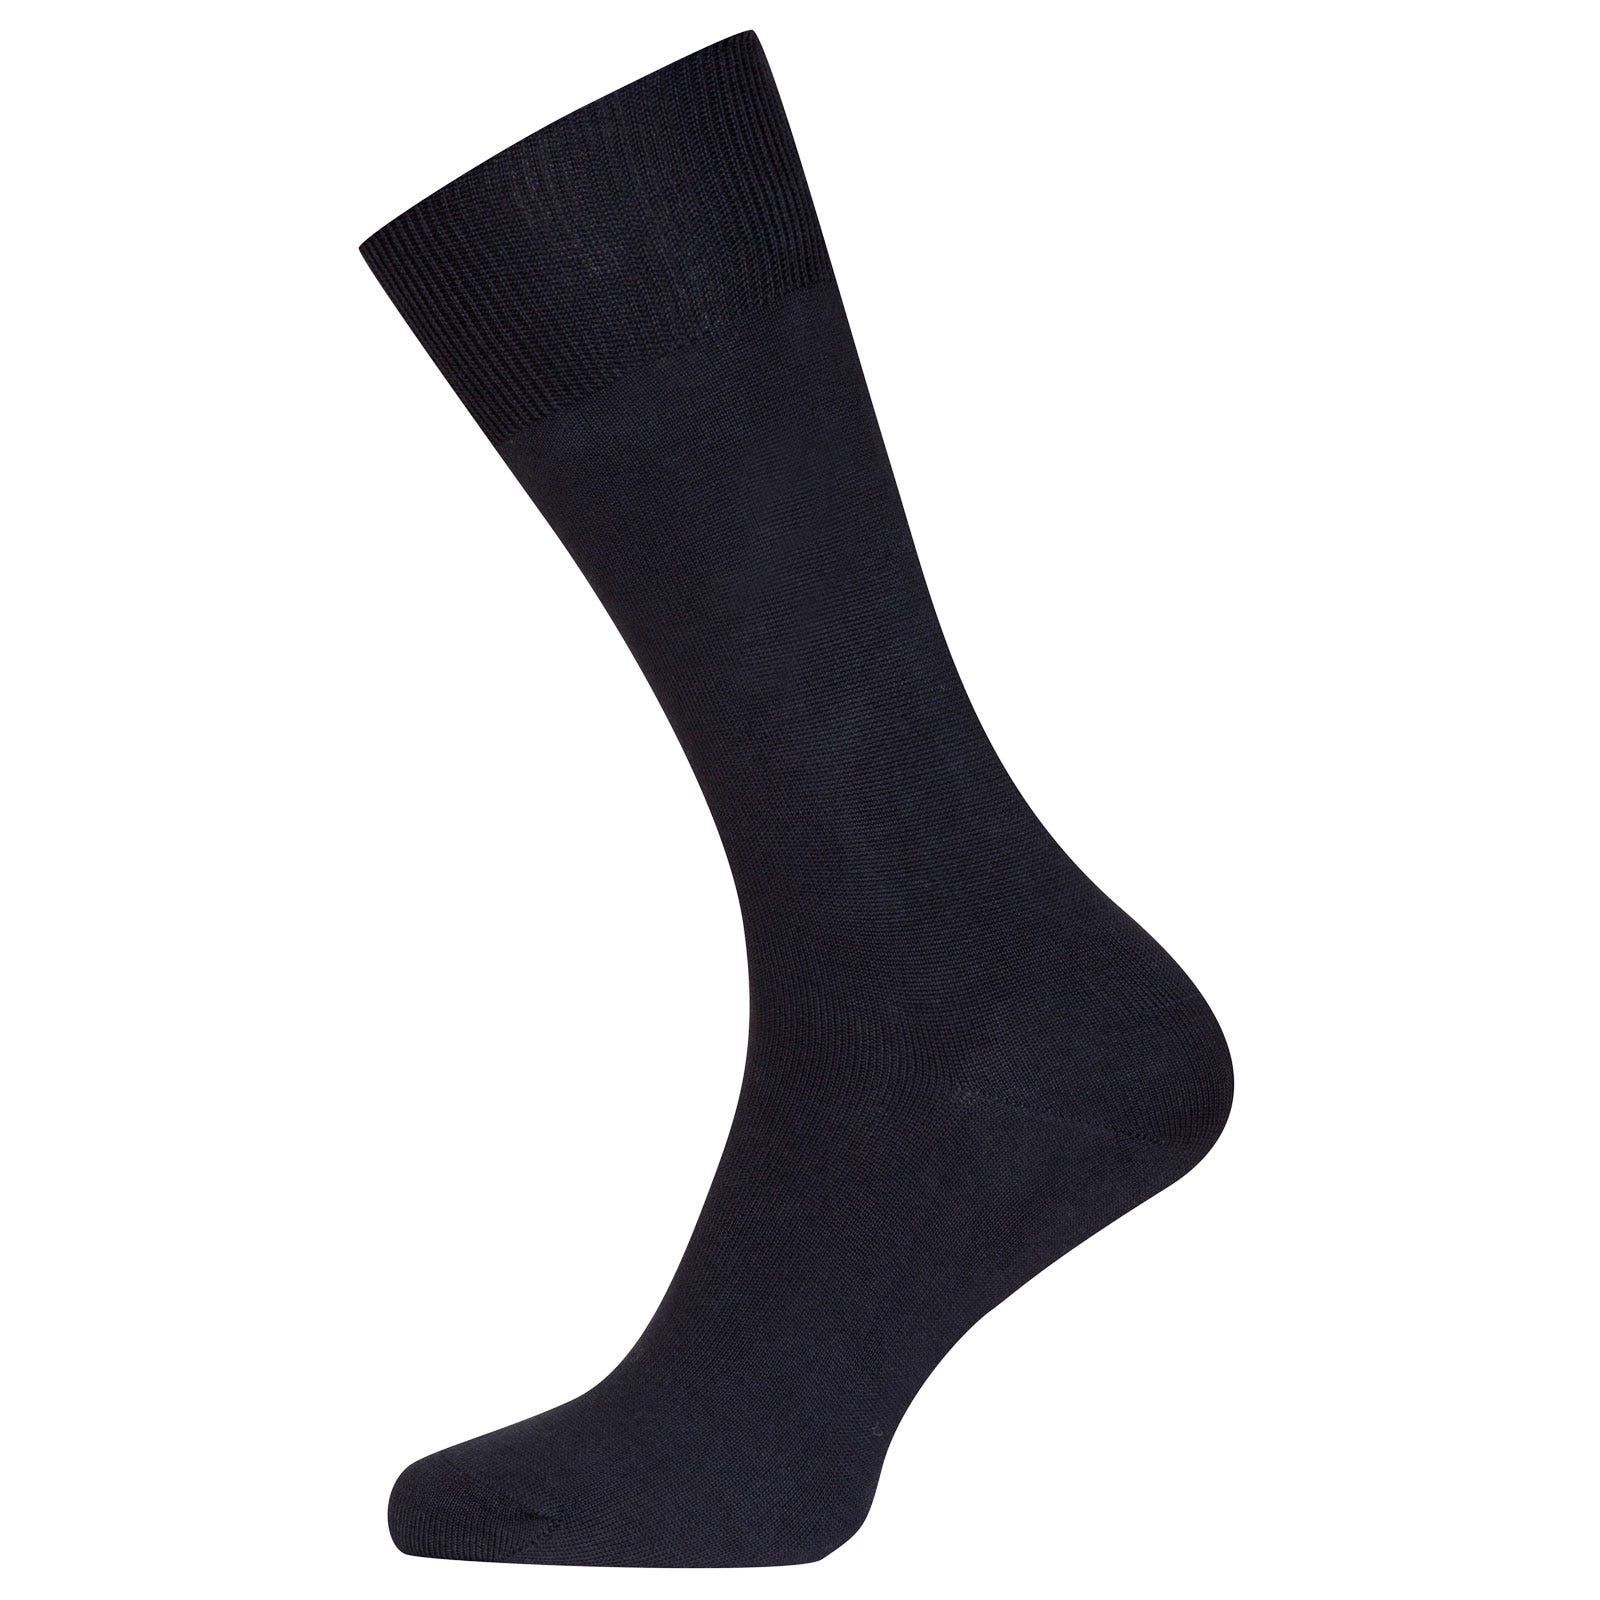 John Smedley Sigma Sea Island Cotton Socks in Navy-M/L